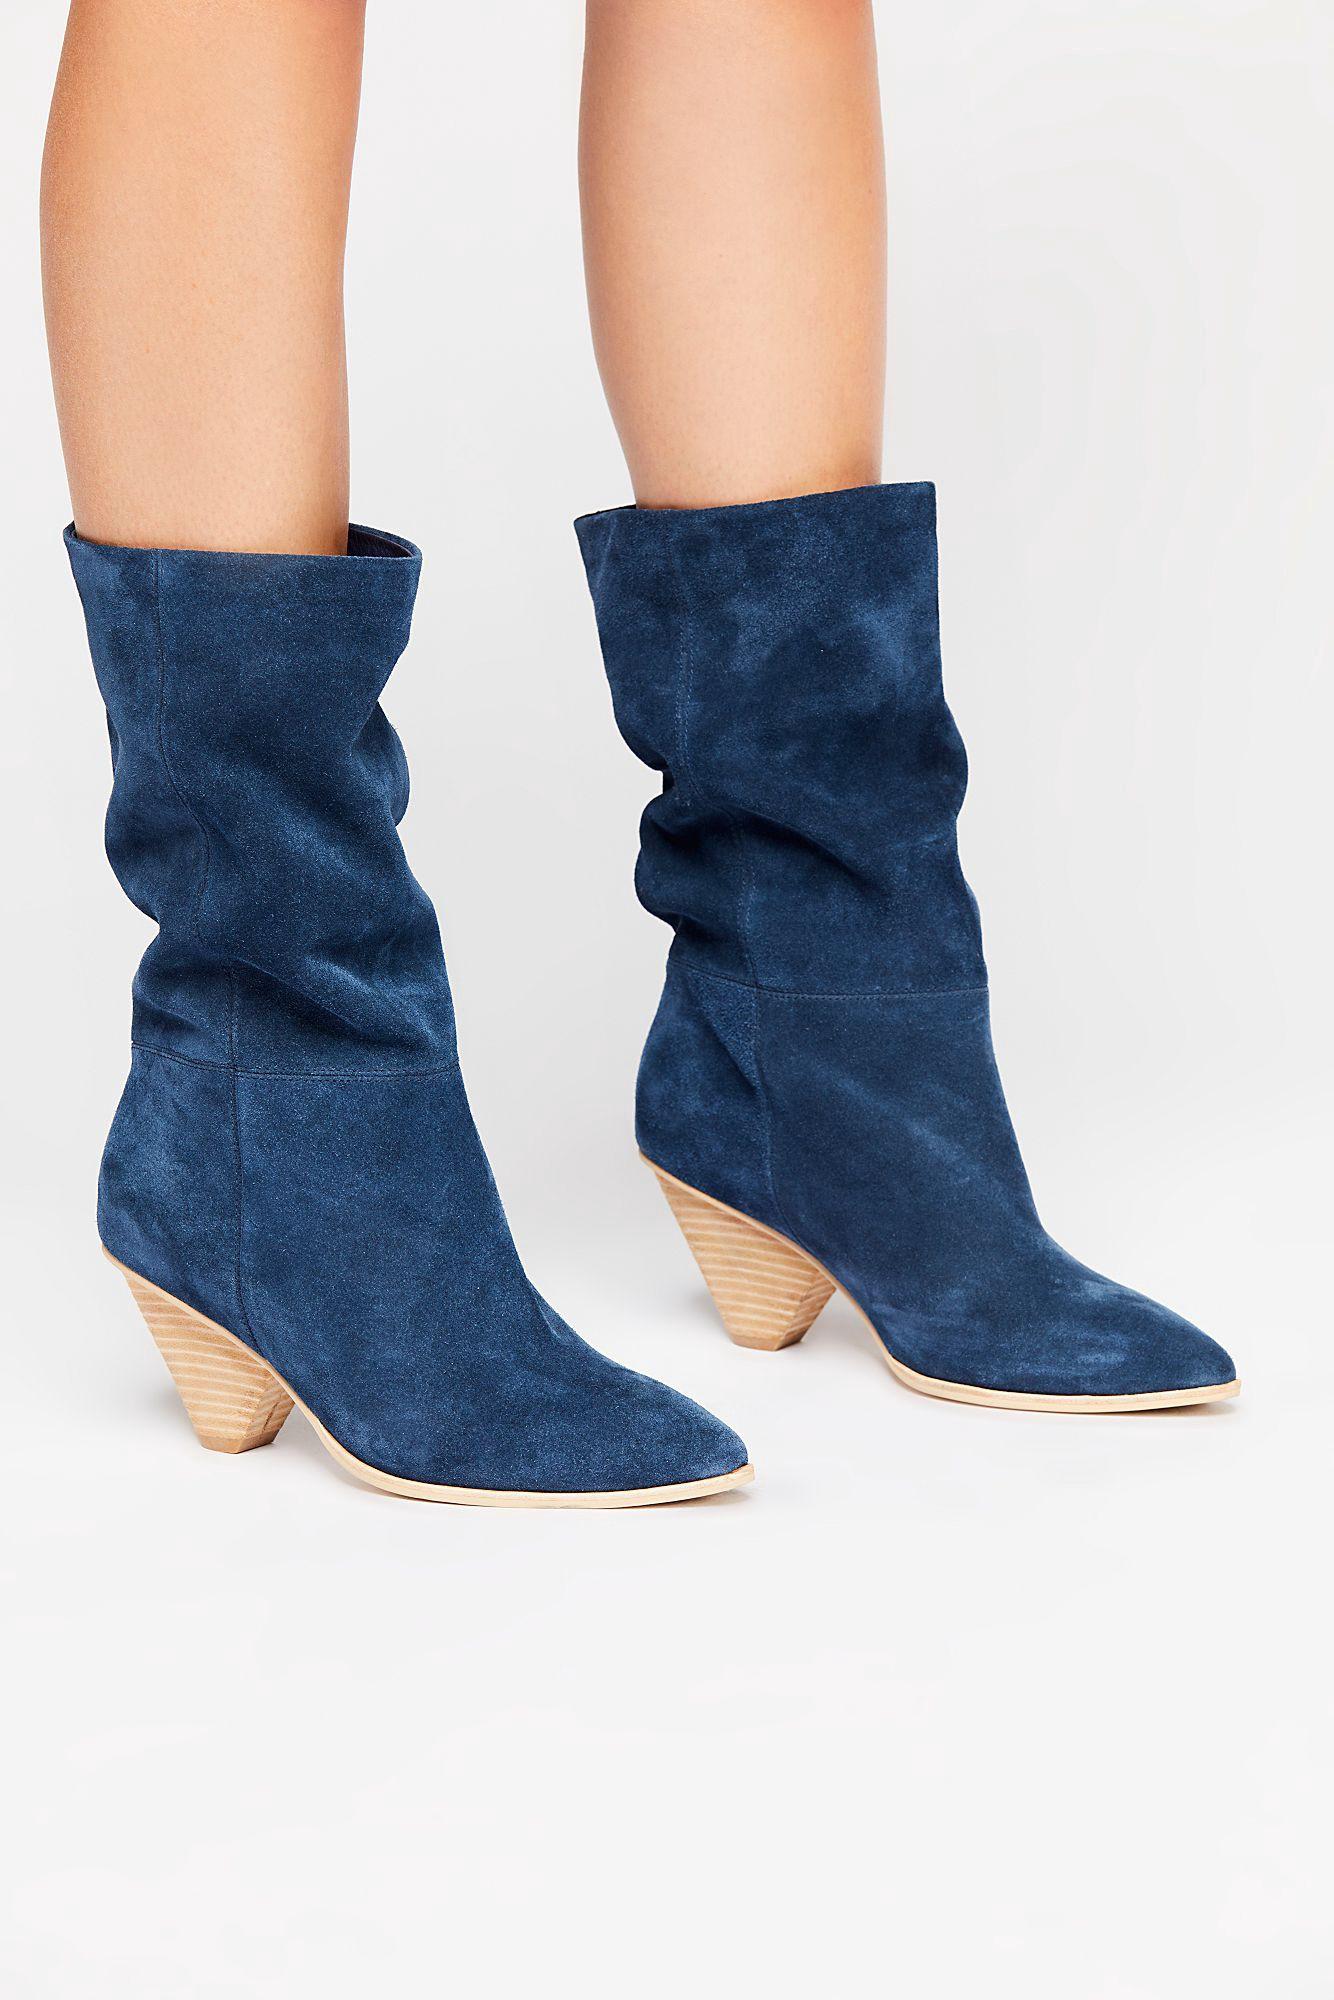 e0d3e0672a3f0c Free People Stella Slouch Boot - Tuape 8.5 Free People Boots